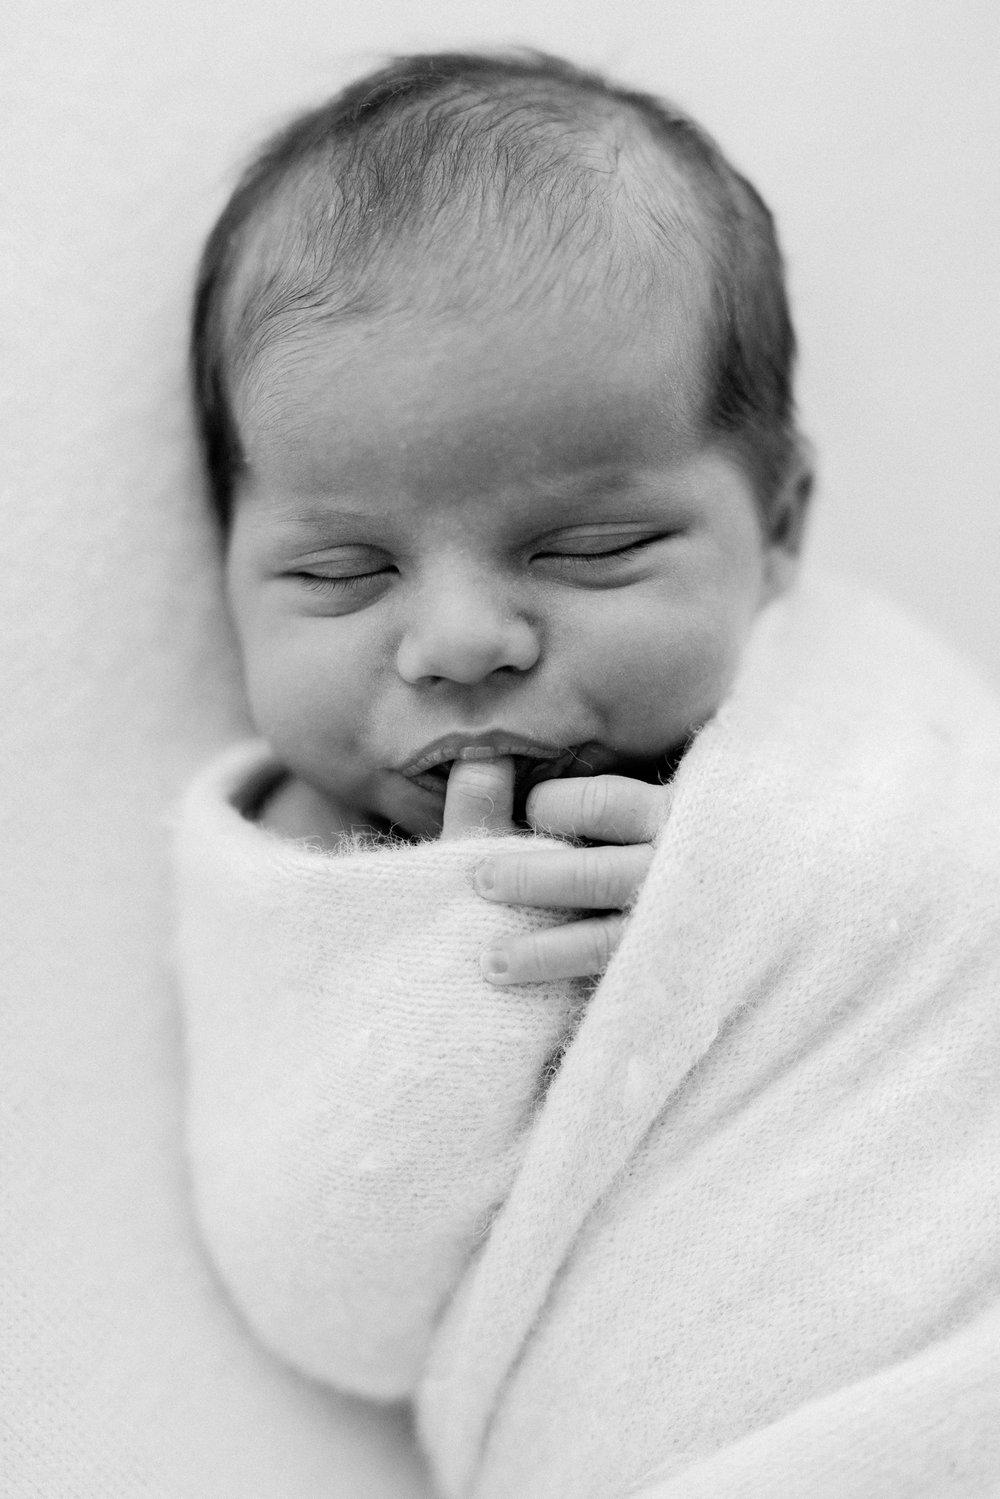 Baby Sienna - Natural Newborn Photography in Adelaide - Simple Newborn Photography - Beautiful Newborn Photography - Katherine Schultz - www.katherineschultzphotography.com_0007.jpg